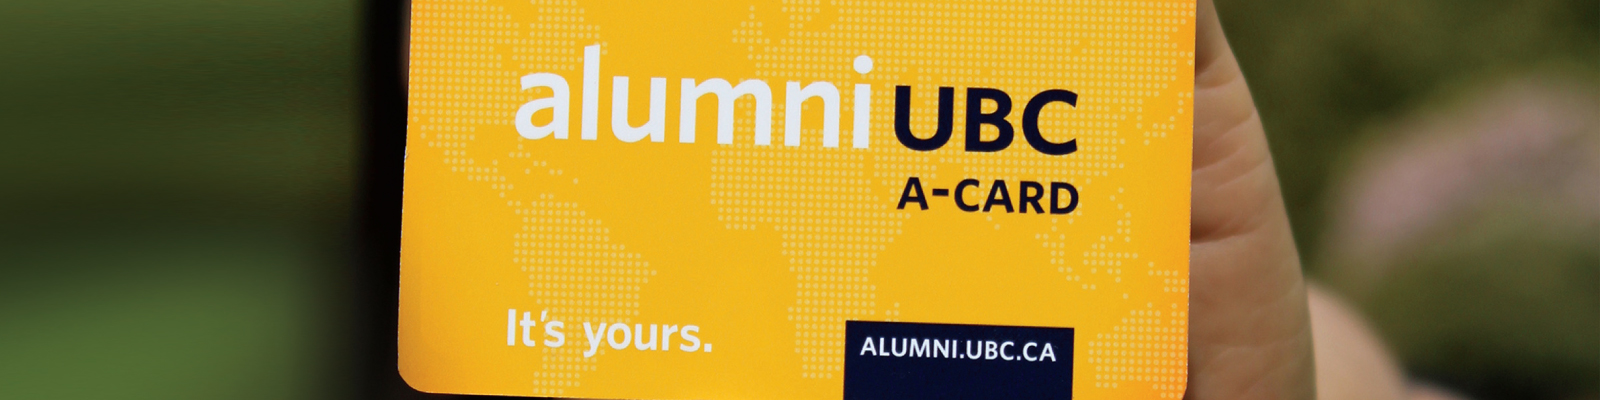 Alumni A-Card